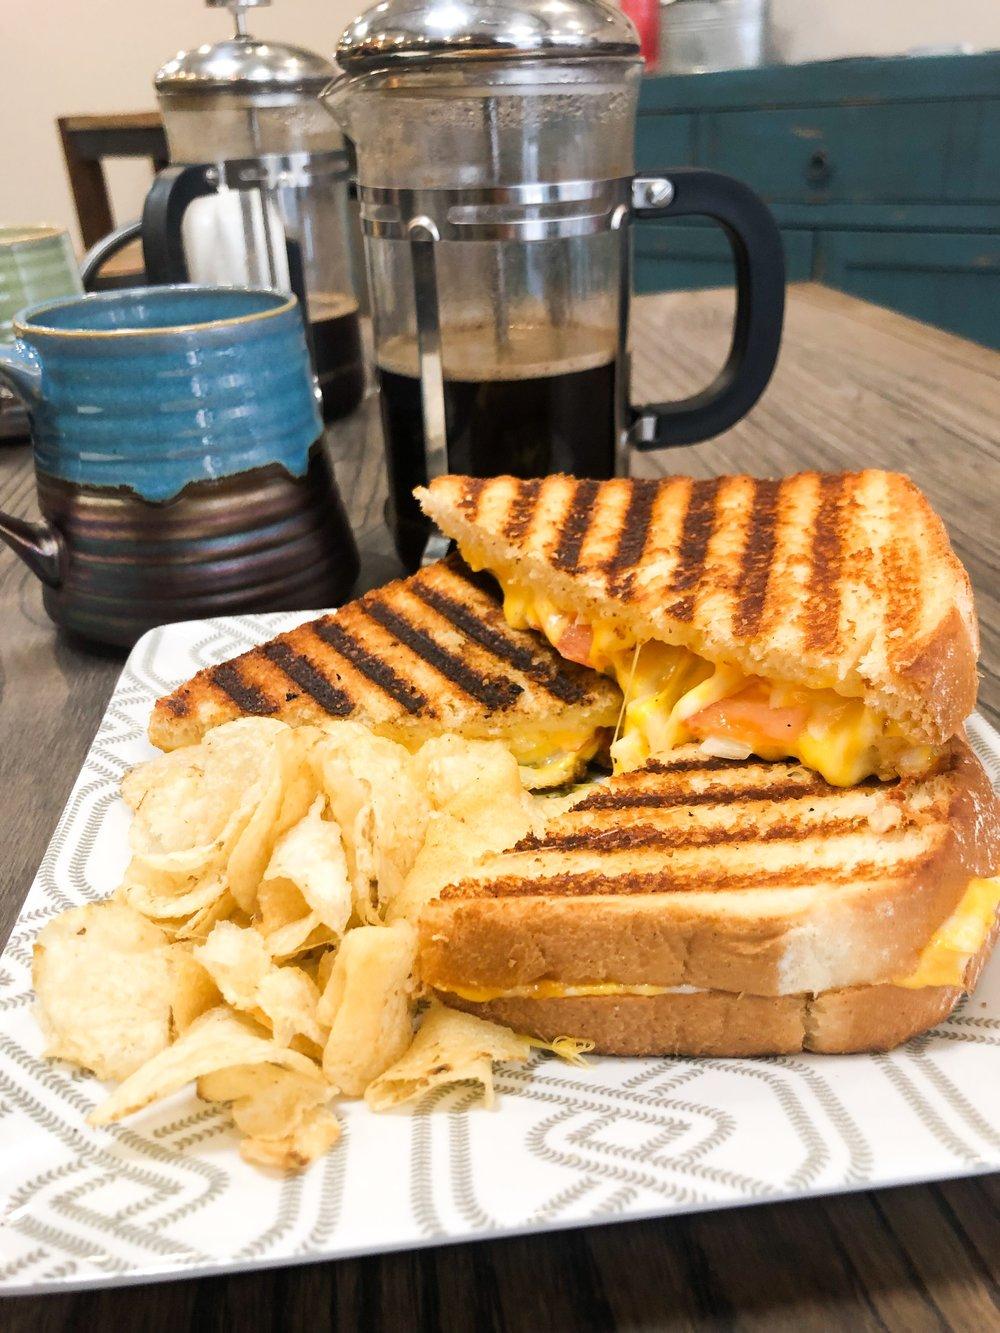 The Post-Segment Dunbri's Tomato Onion Grilled Cheese Sandwich & French Press Coffee.